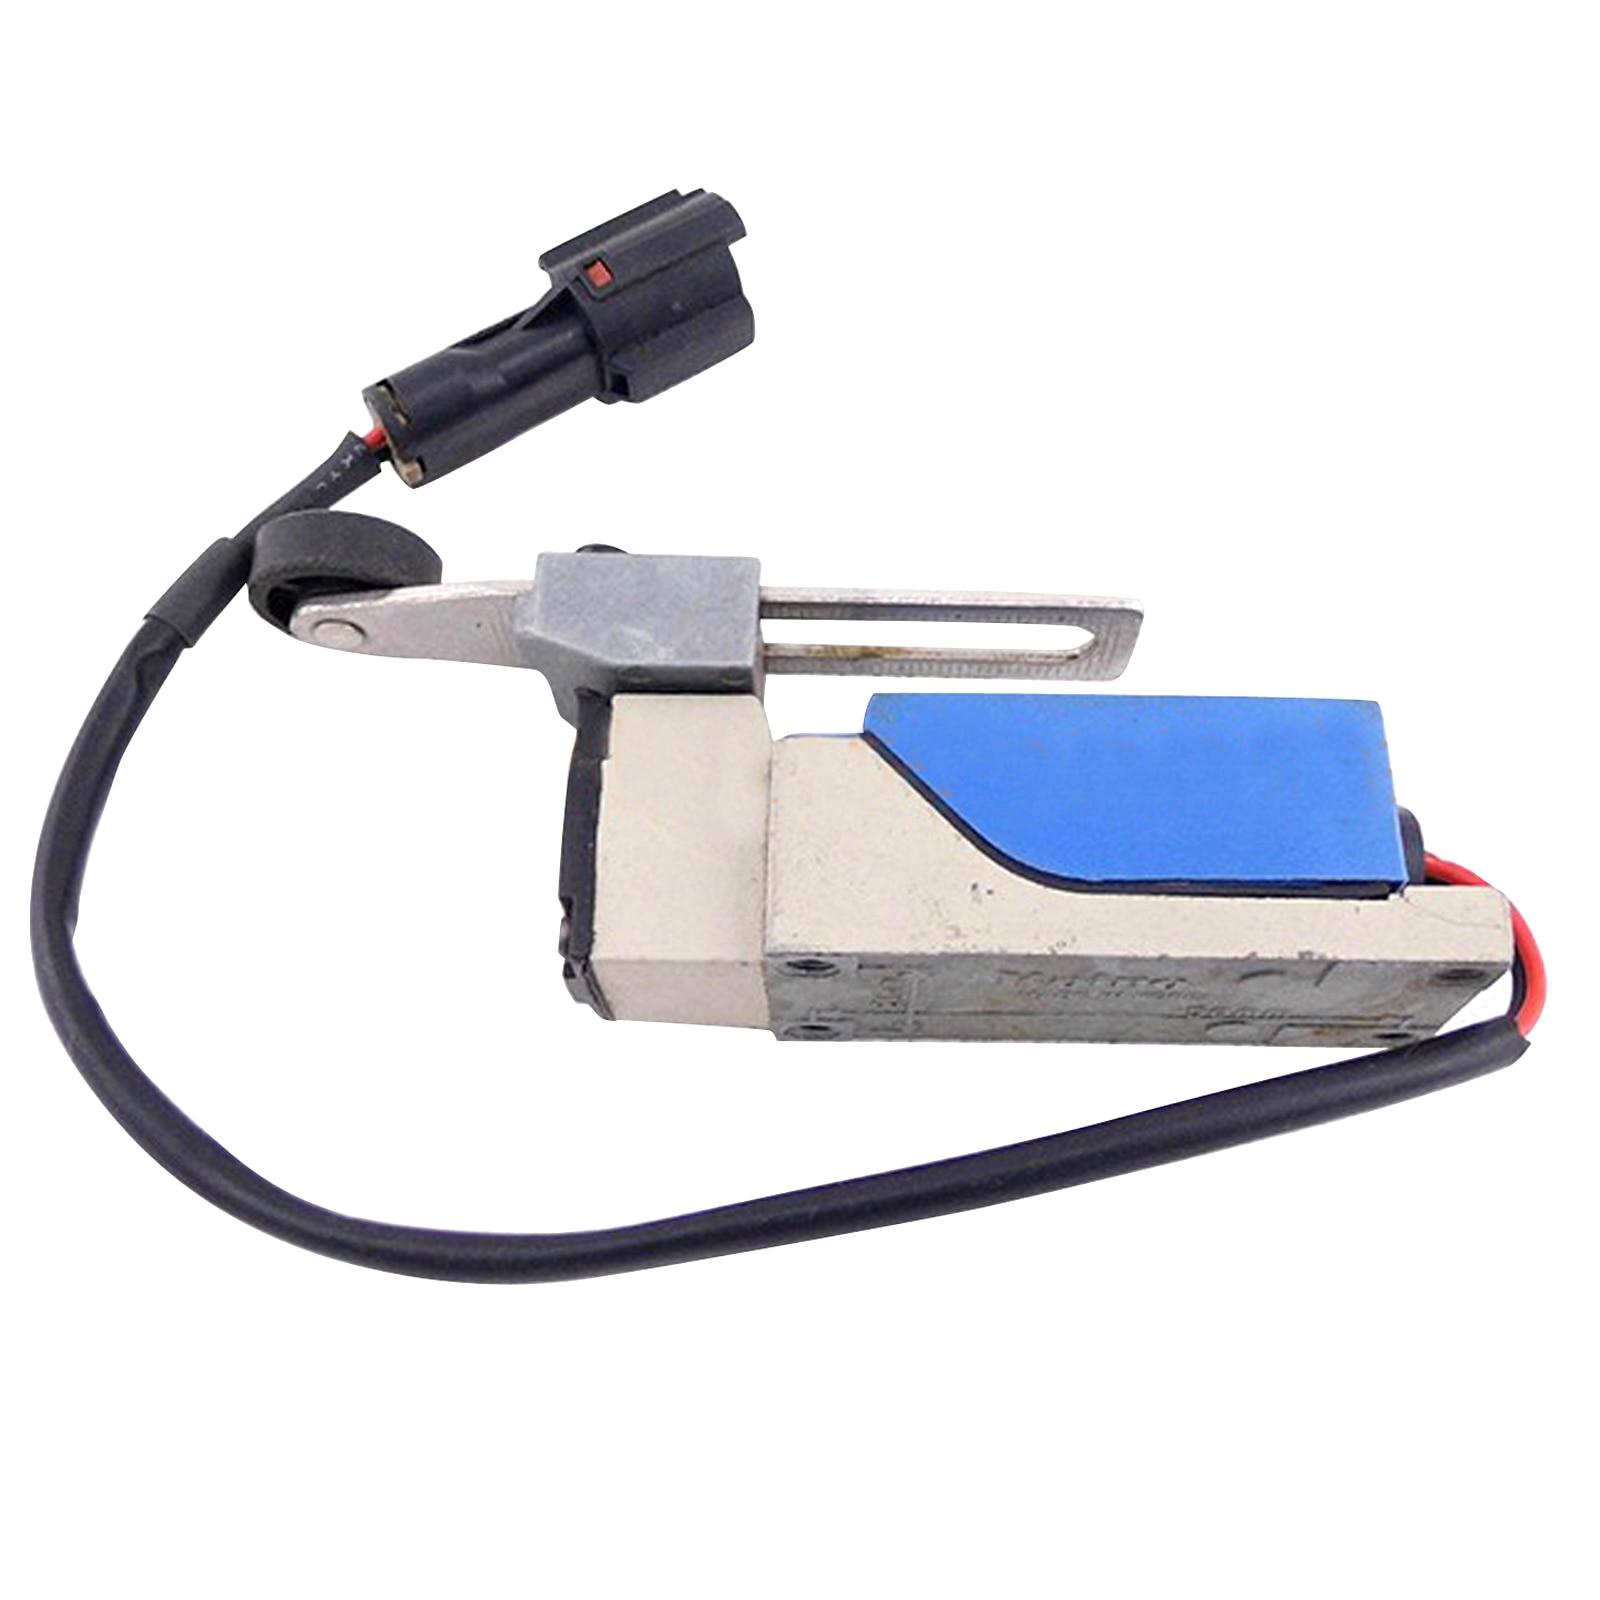 Solenoid Valve Magnetic Switch 301411 00030 30141100030 Fits Daewoo Doosan Excavator Parts|A/C Compressor & Clutch| |  - title=